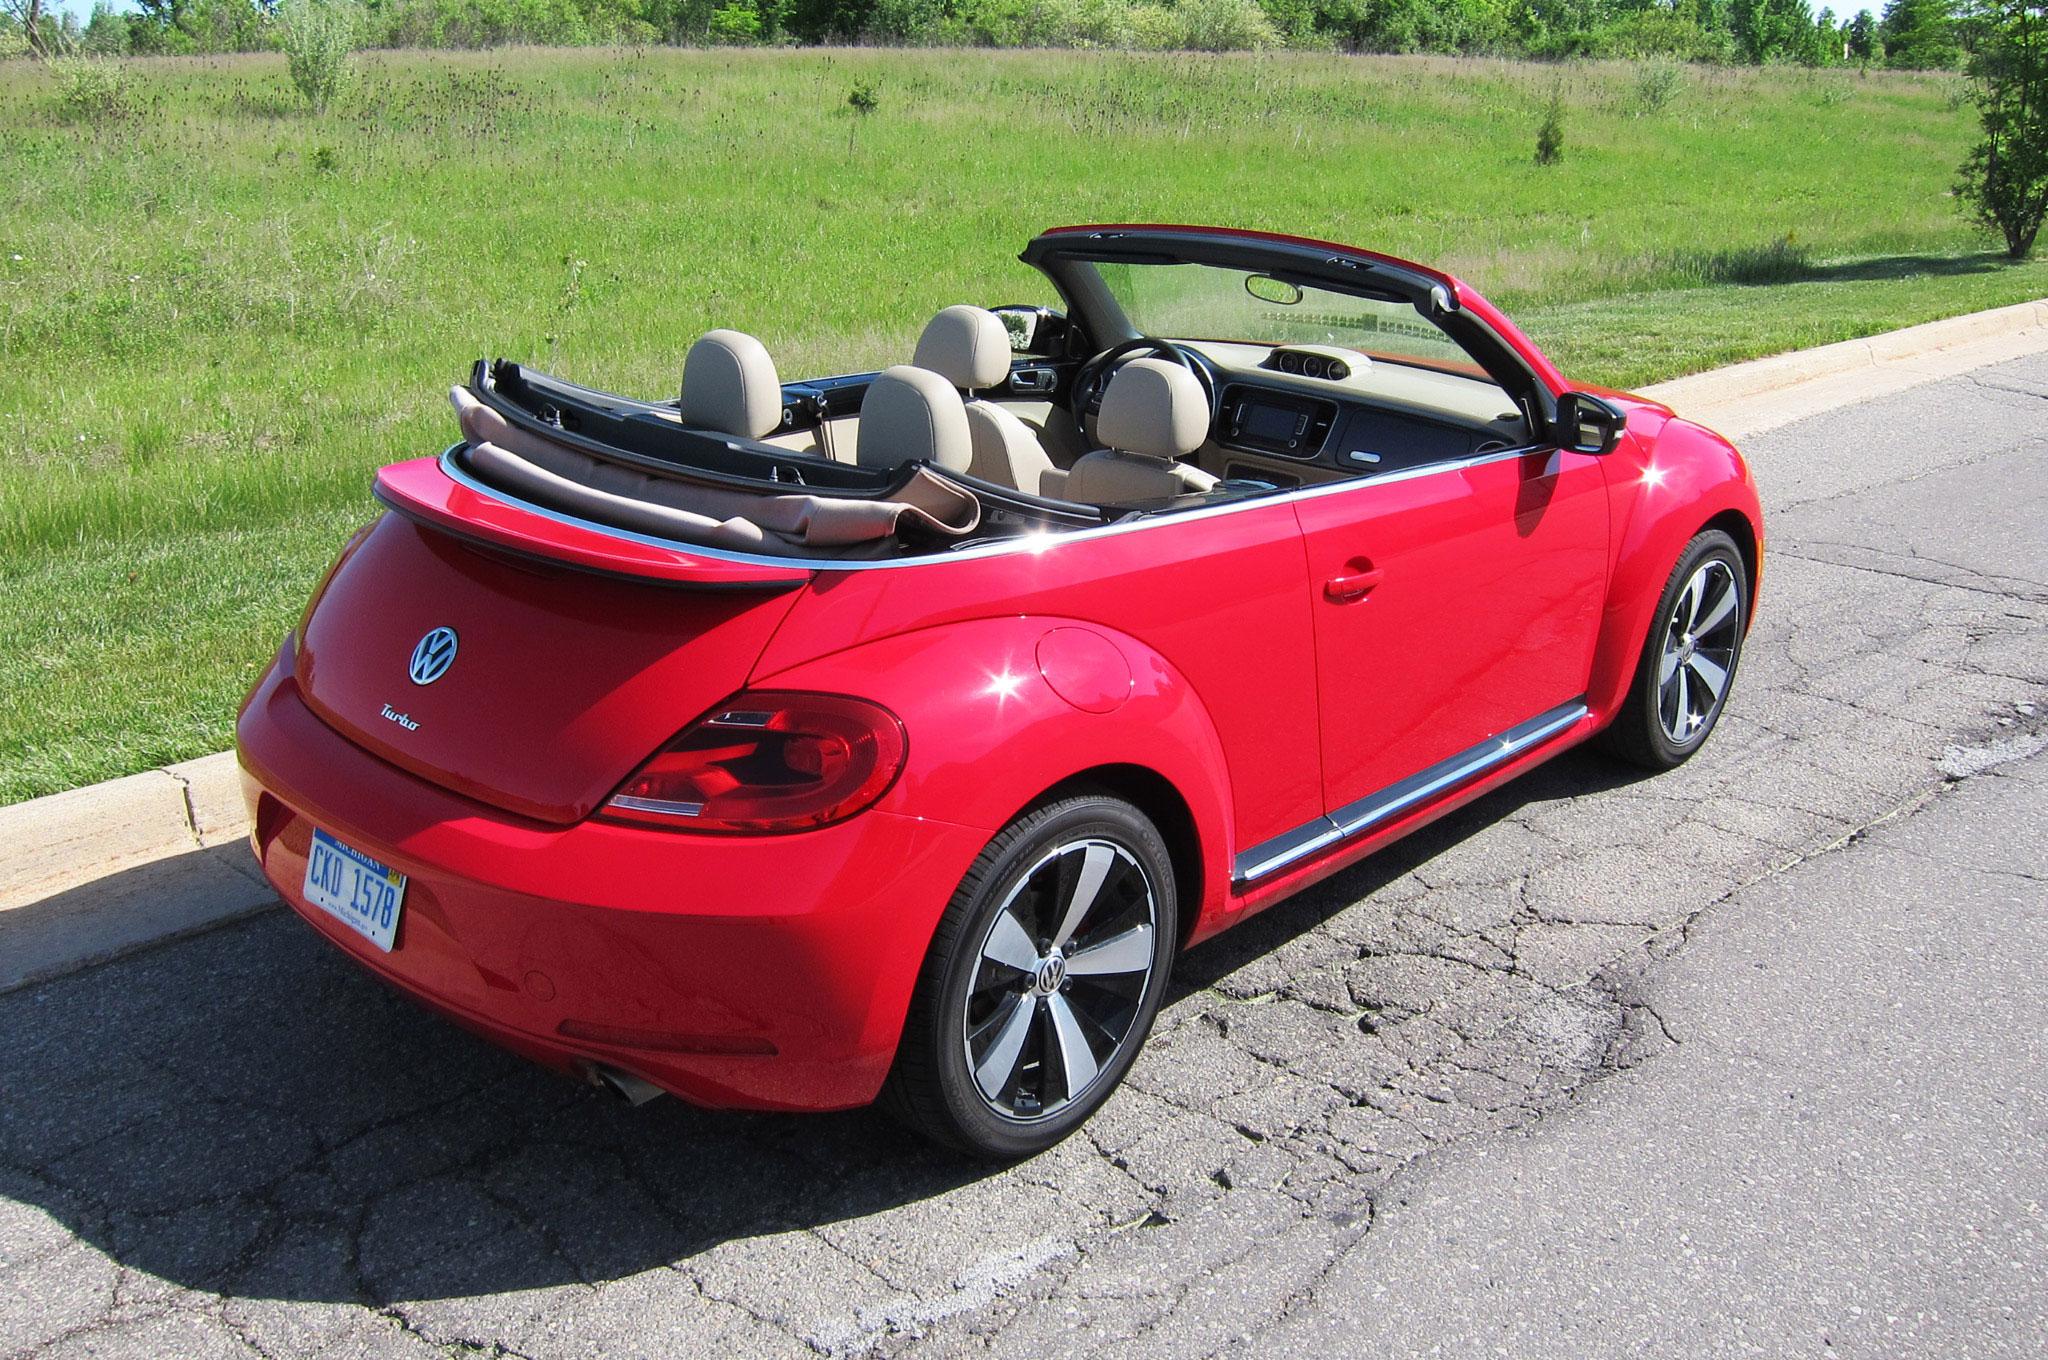 2013 Volkswagen Beetle Turbo Convertible - Four Seasons ...